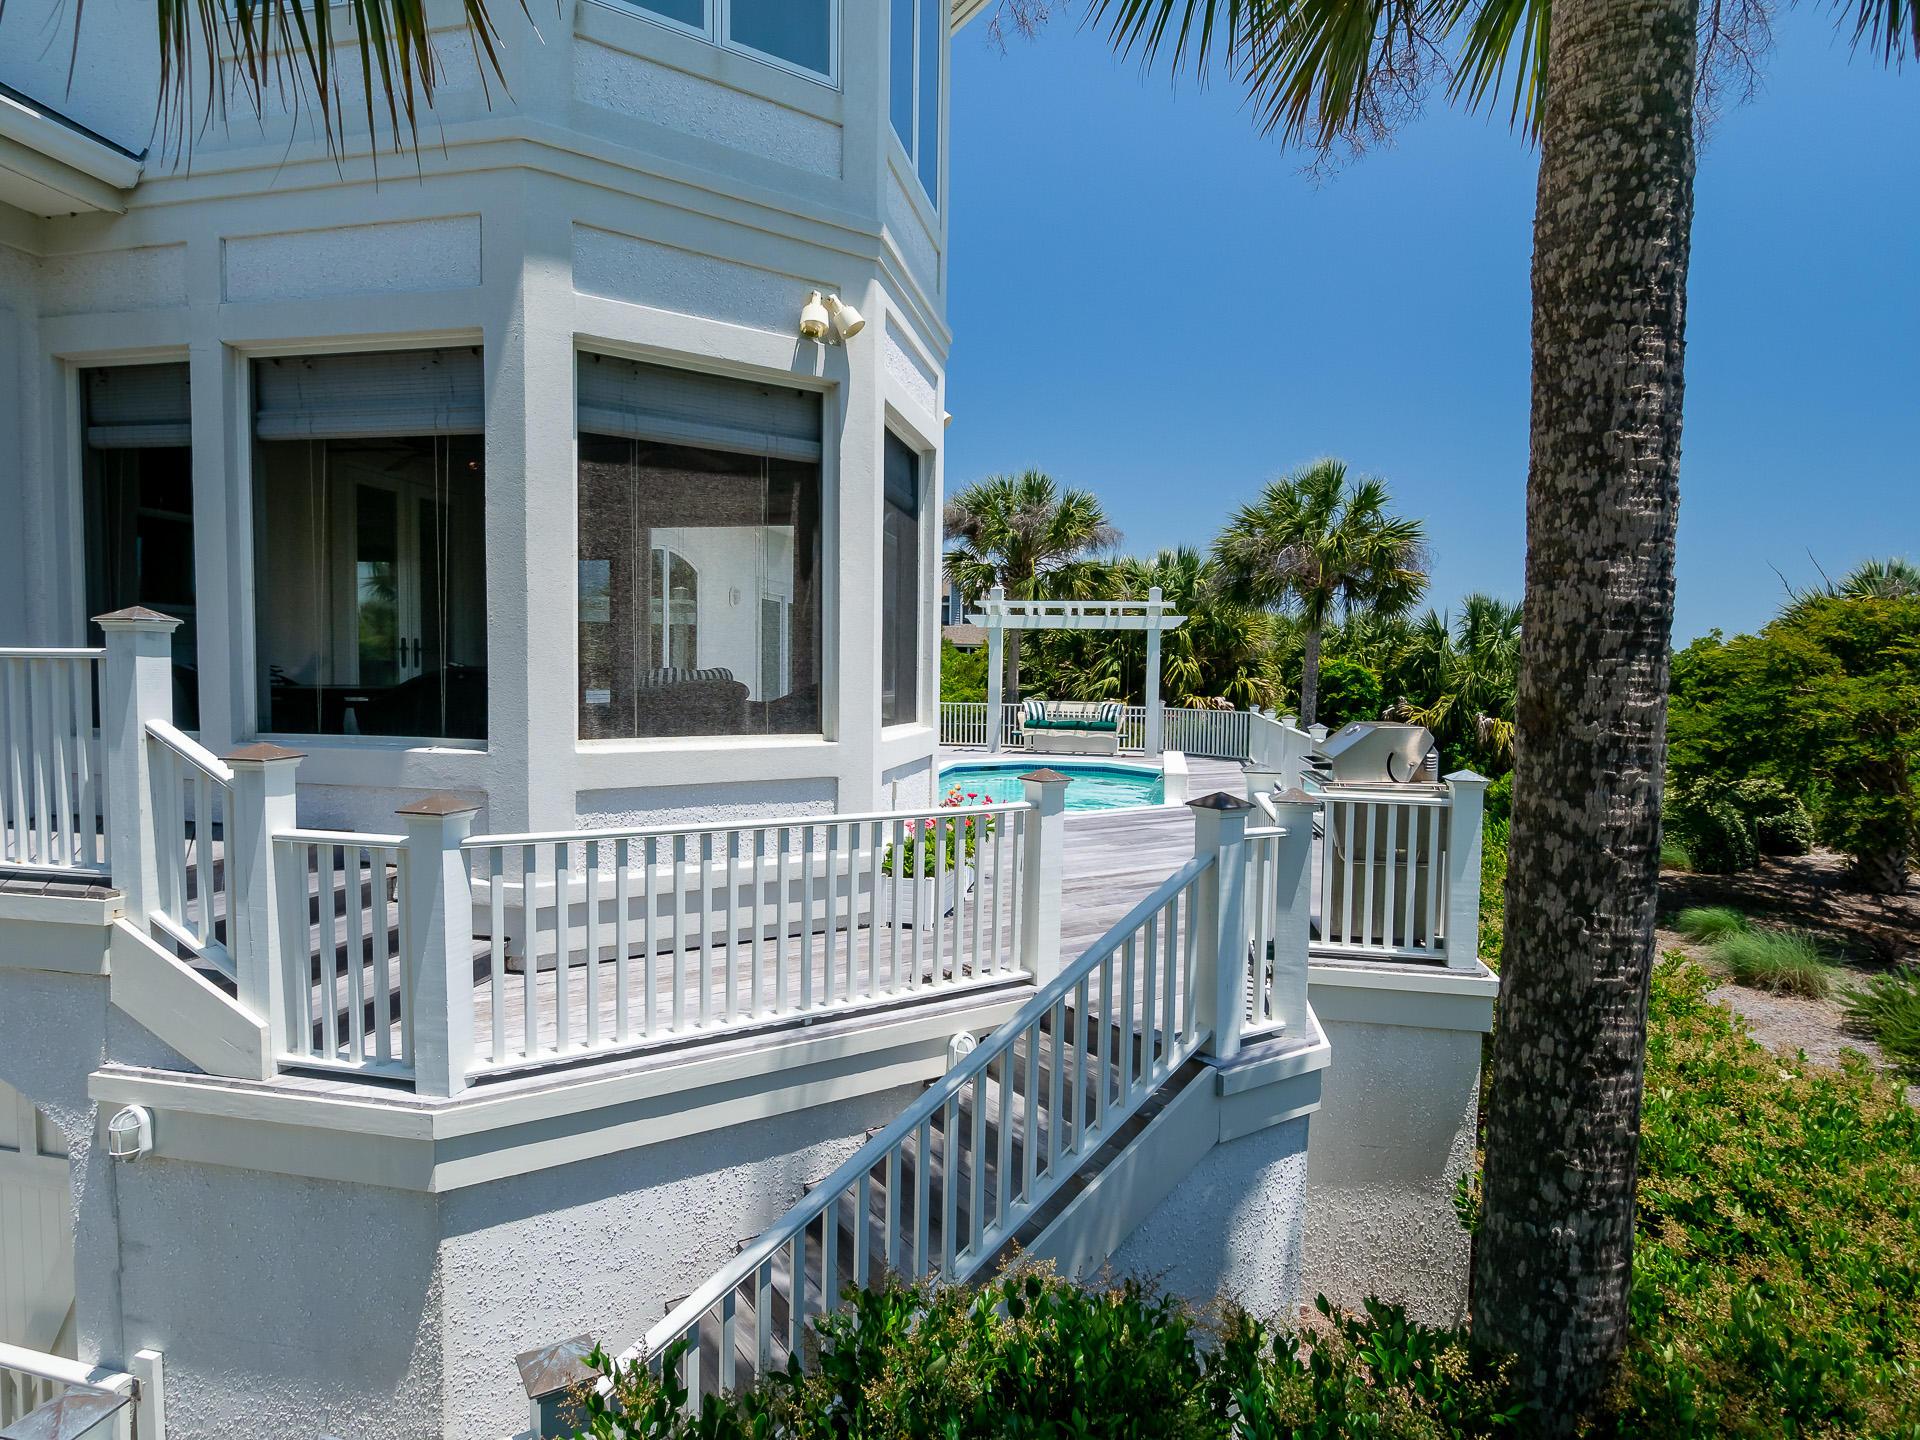 Seabrook Island Homes For Sale - 2216 Rolling Dune, Seabrook Island, SC - 51